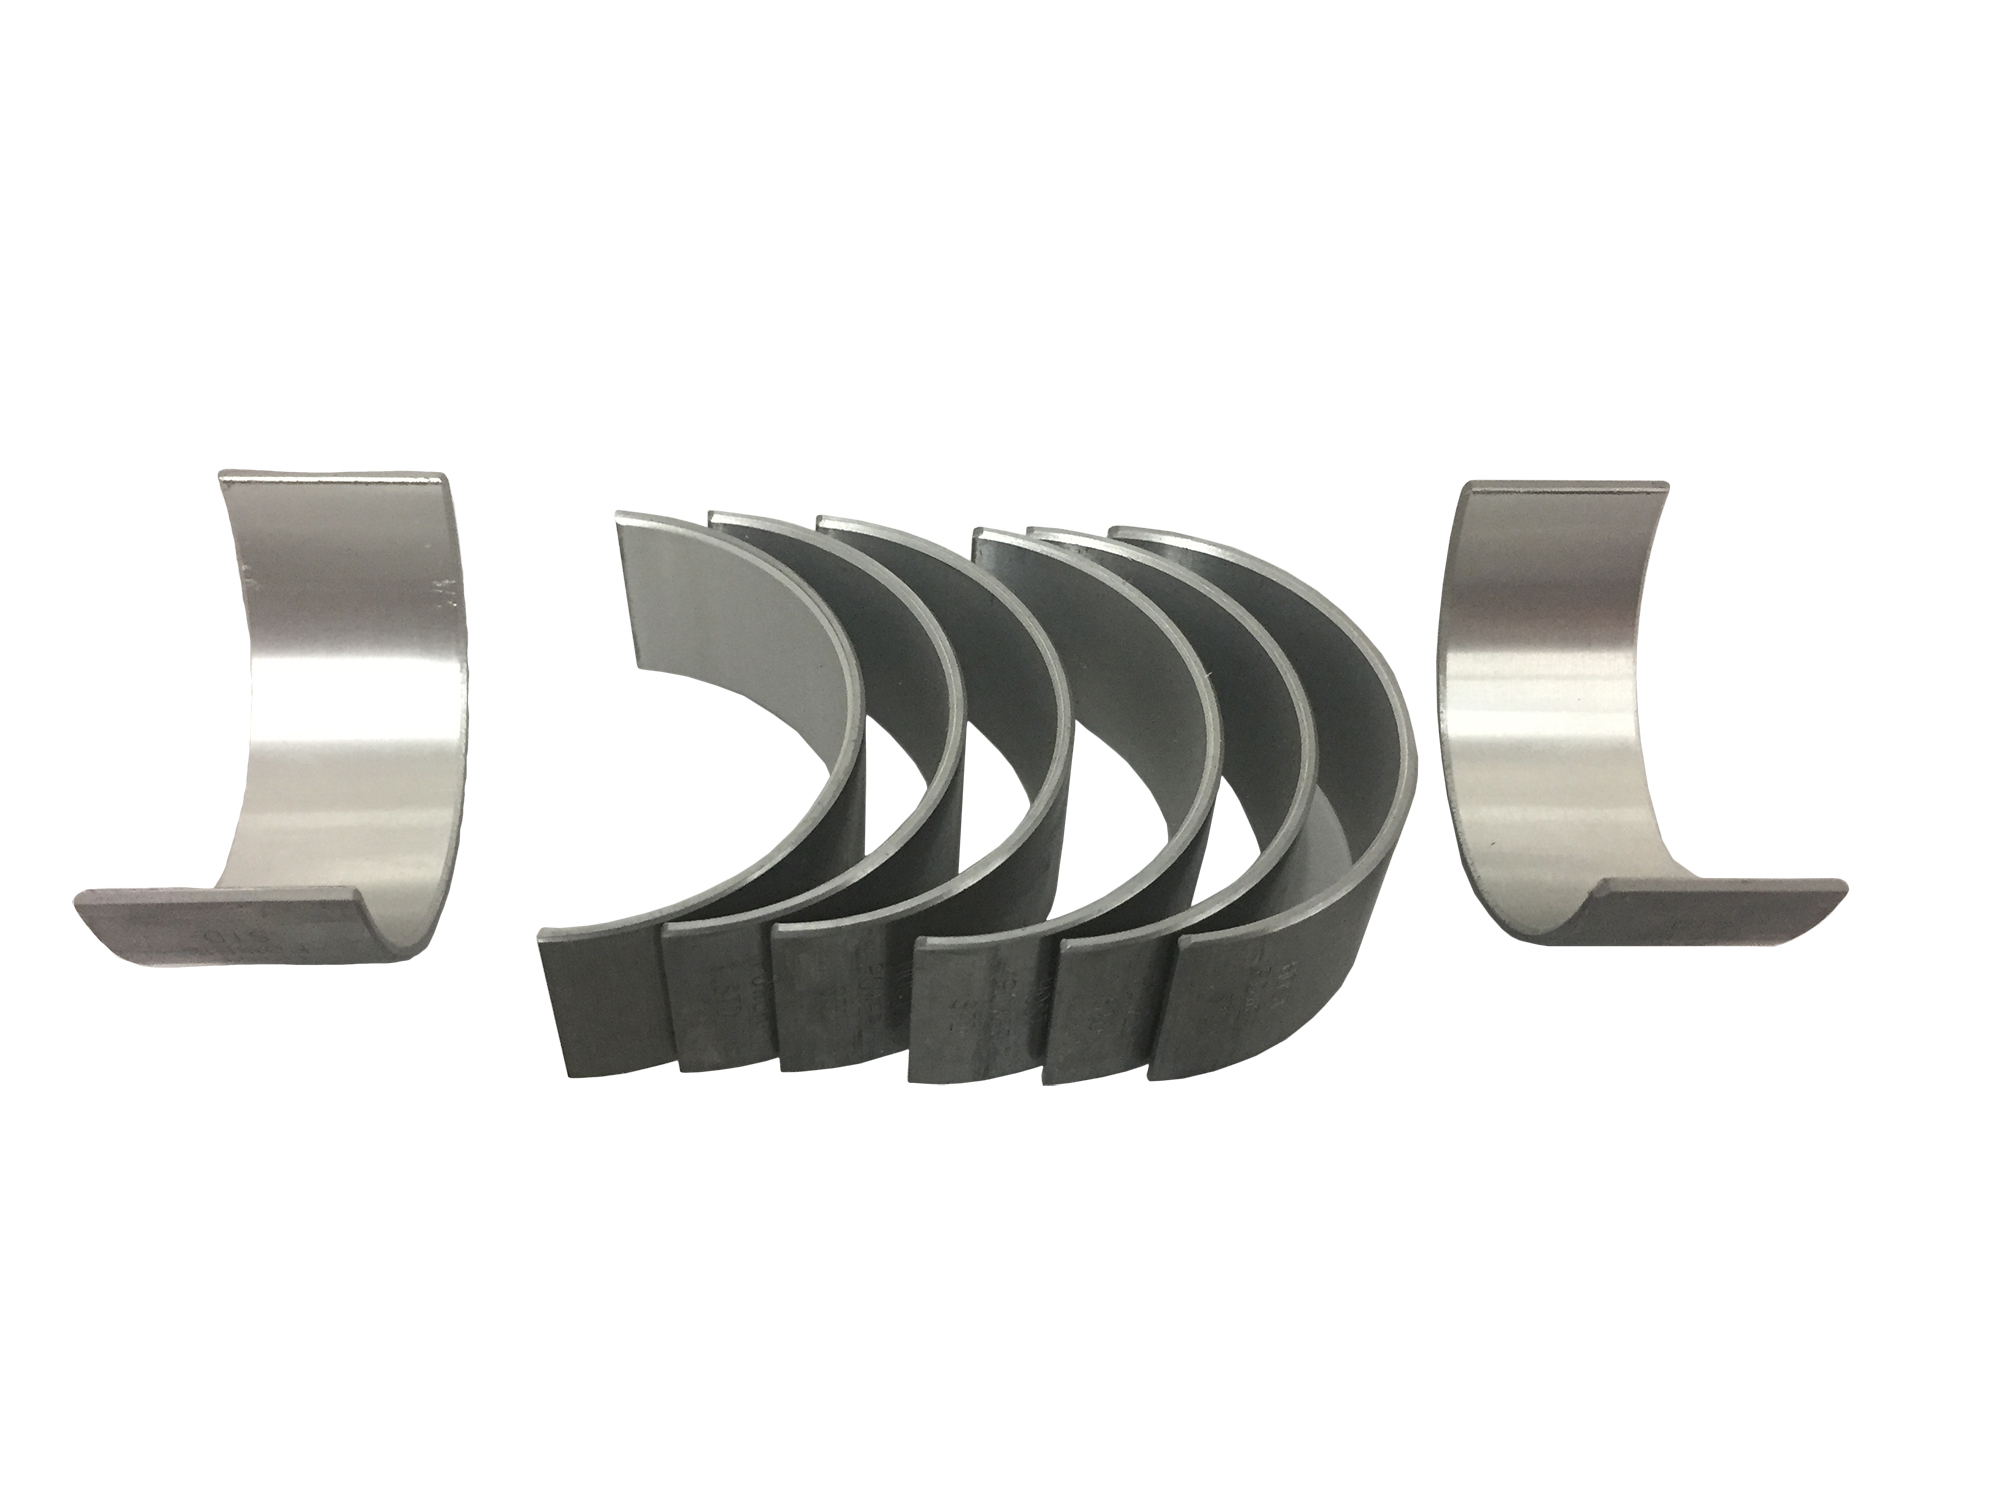 Pleuellagerschale Pleuellager STD Mini Cooper R56 1,6 N18B16A 11247586035 NEU